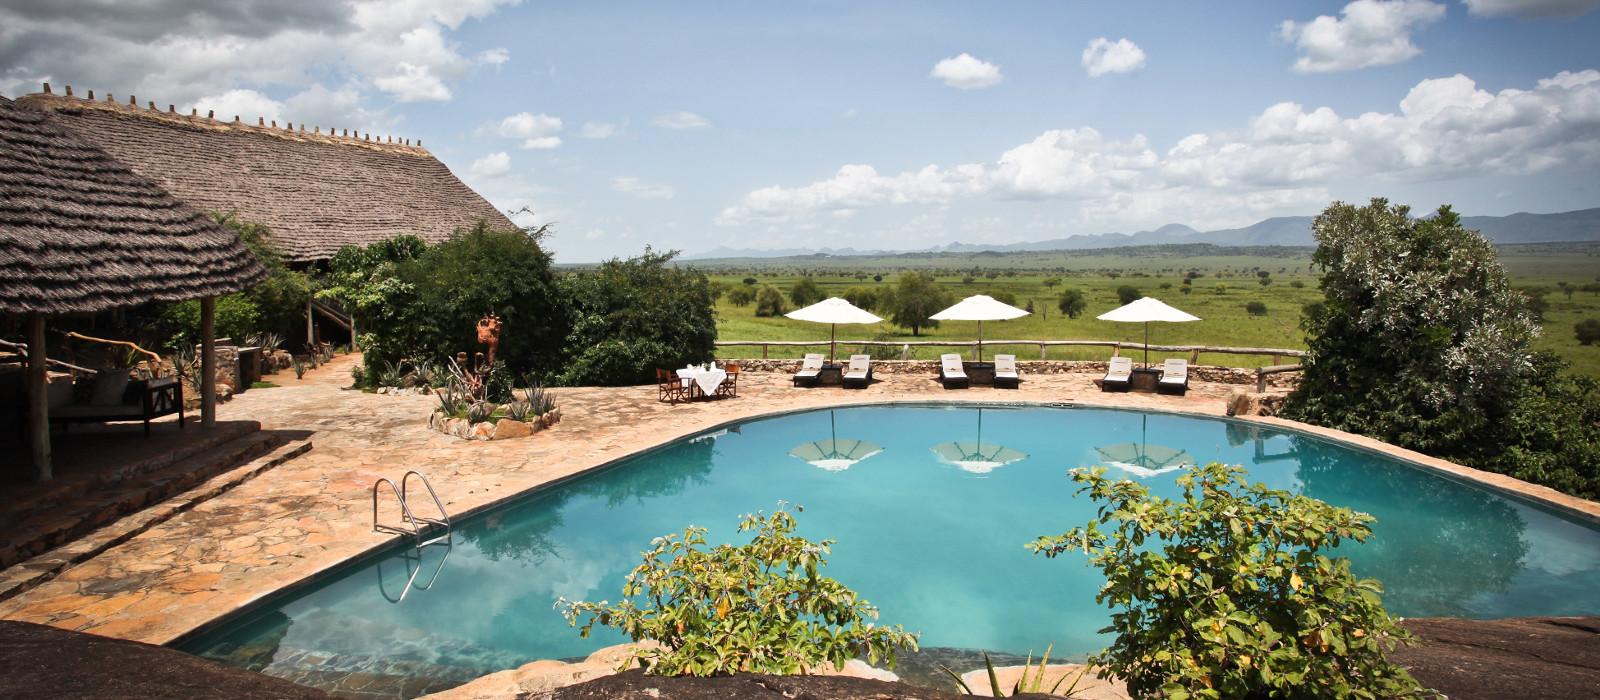 Hotel Apoka Lodge Uganda